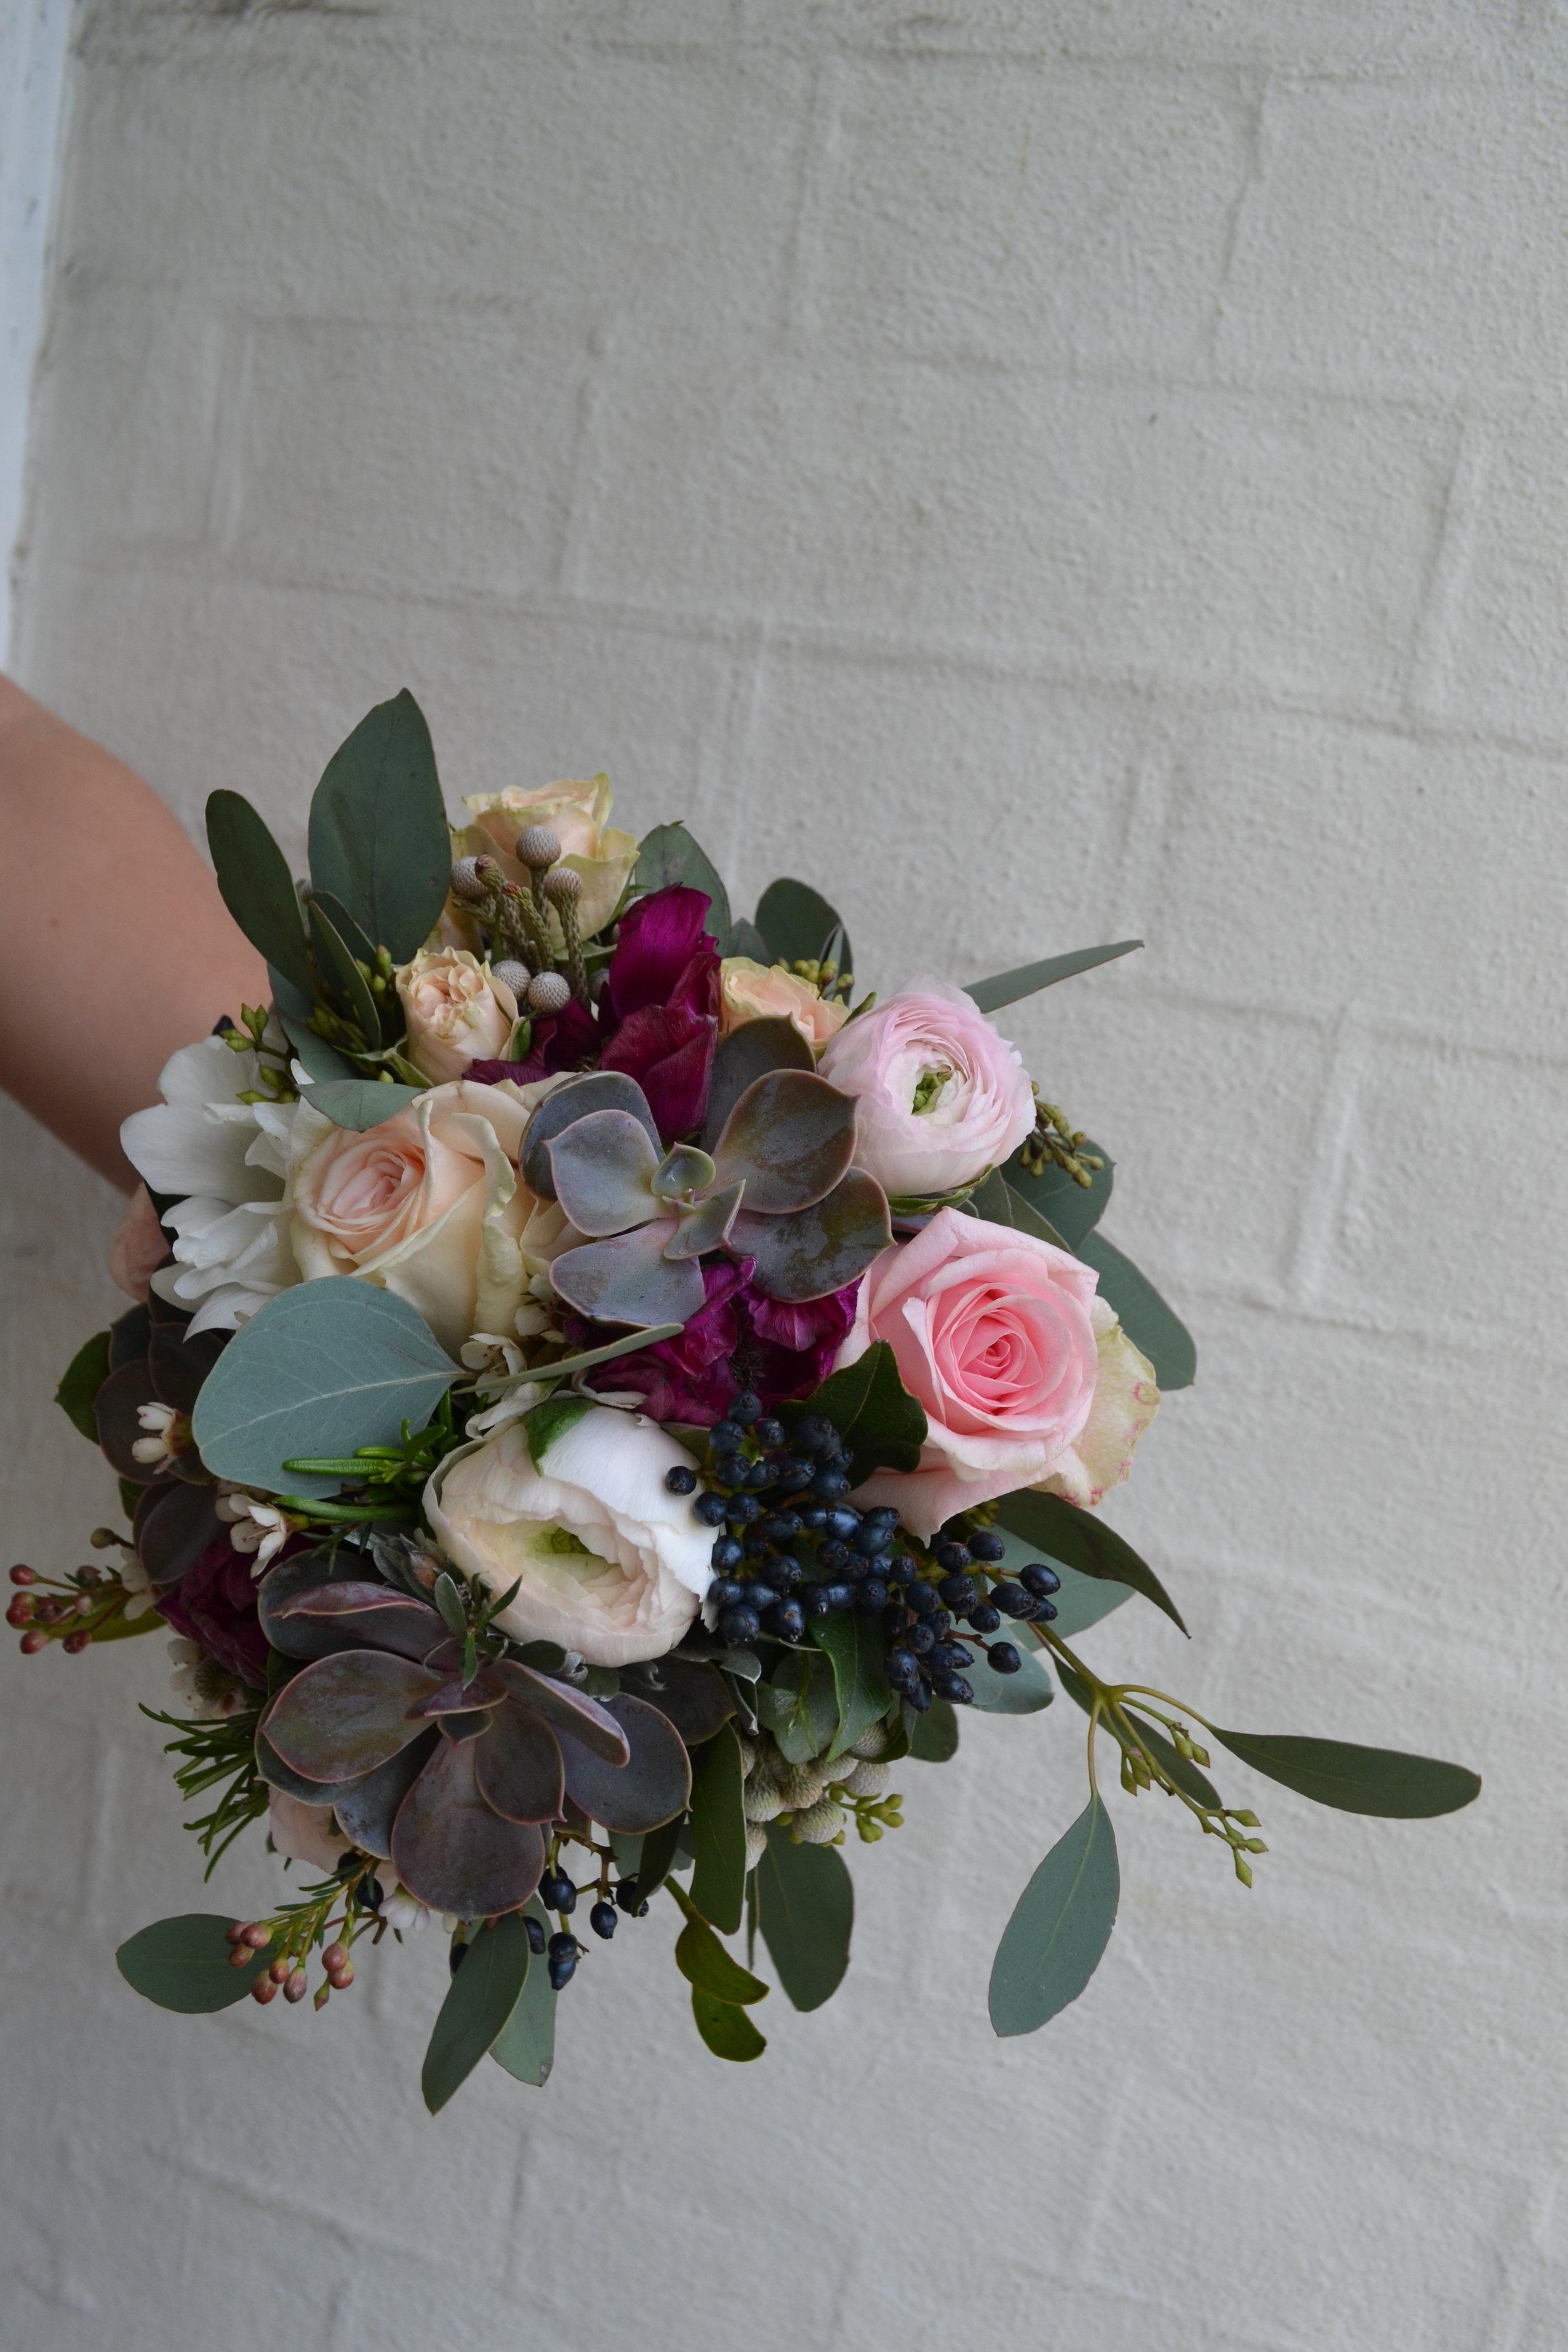 Webb-and-Farrer-Bridal-Bouquet-Brighton-Wedding-Florist (1).JPG